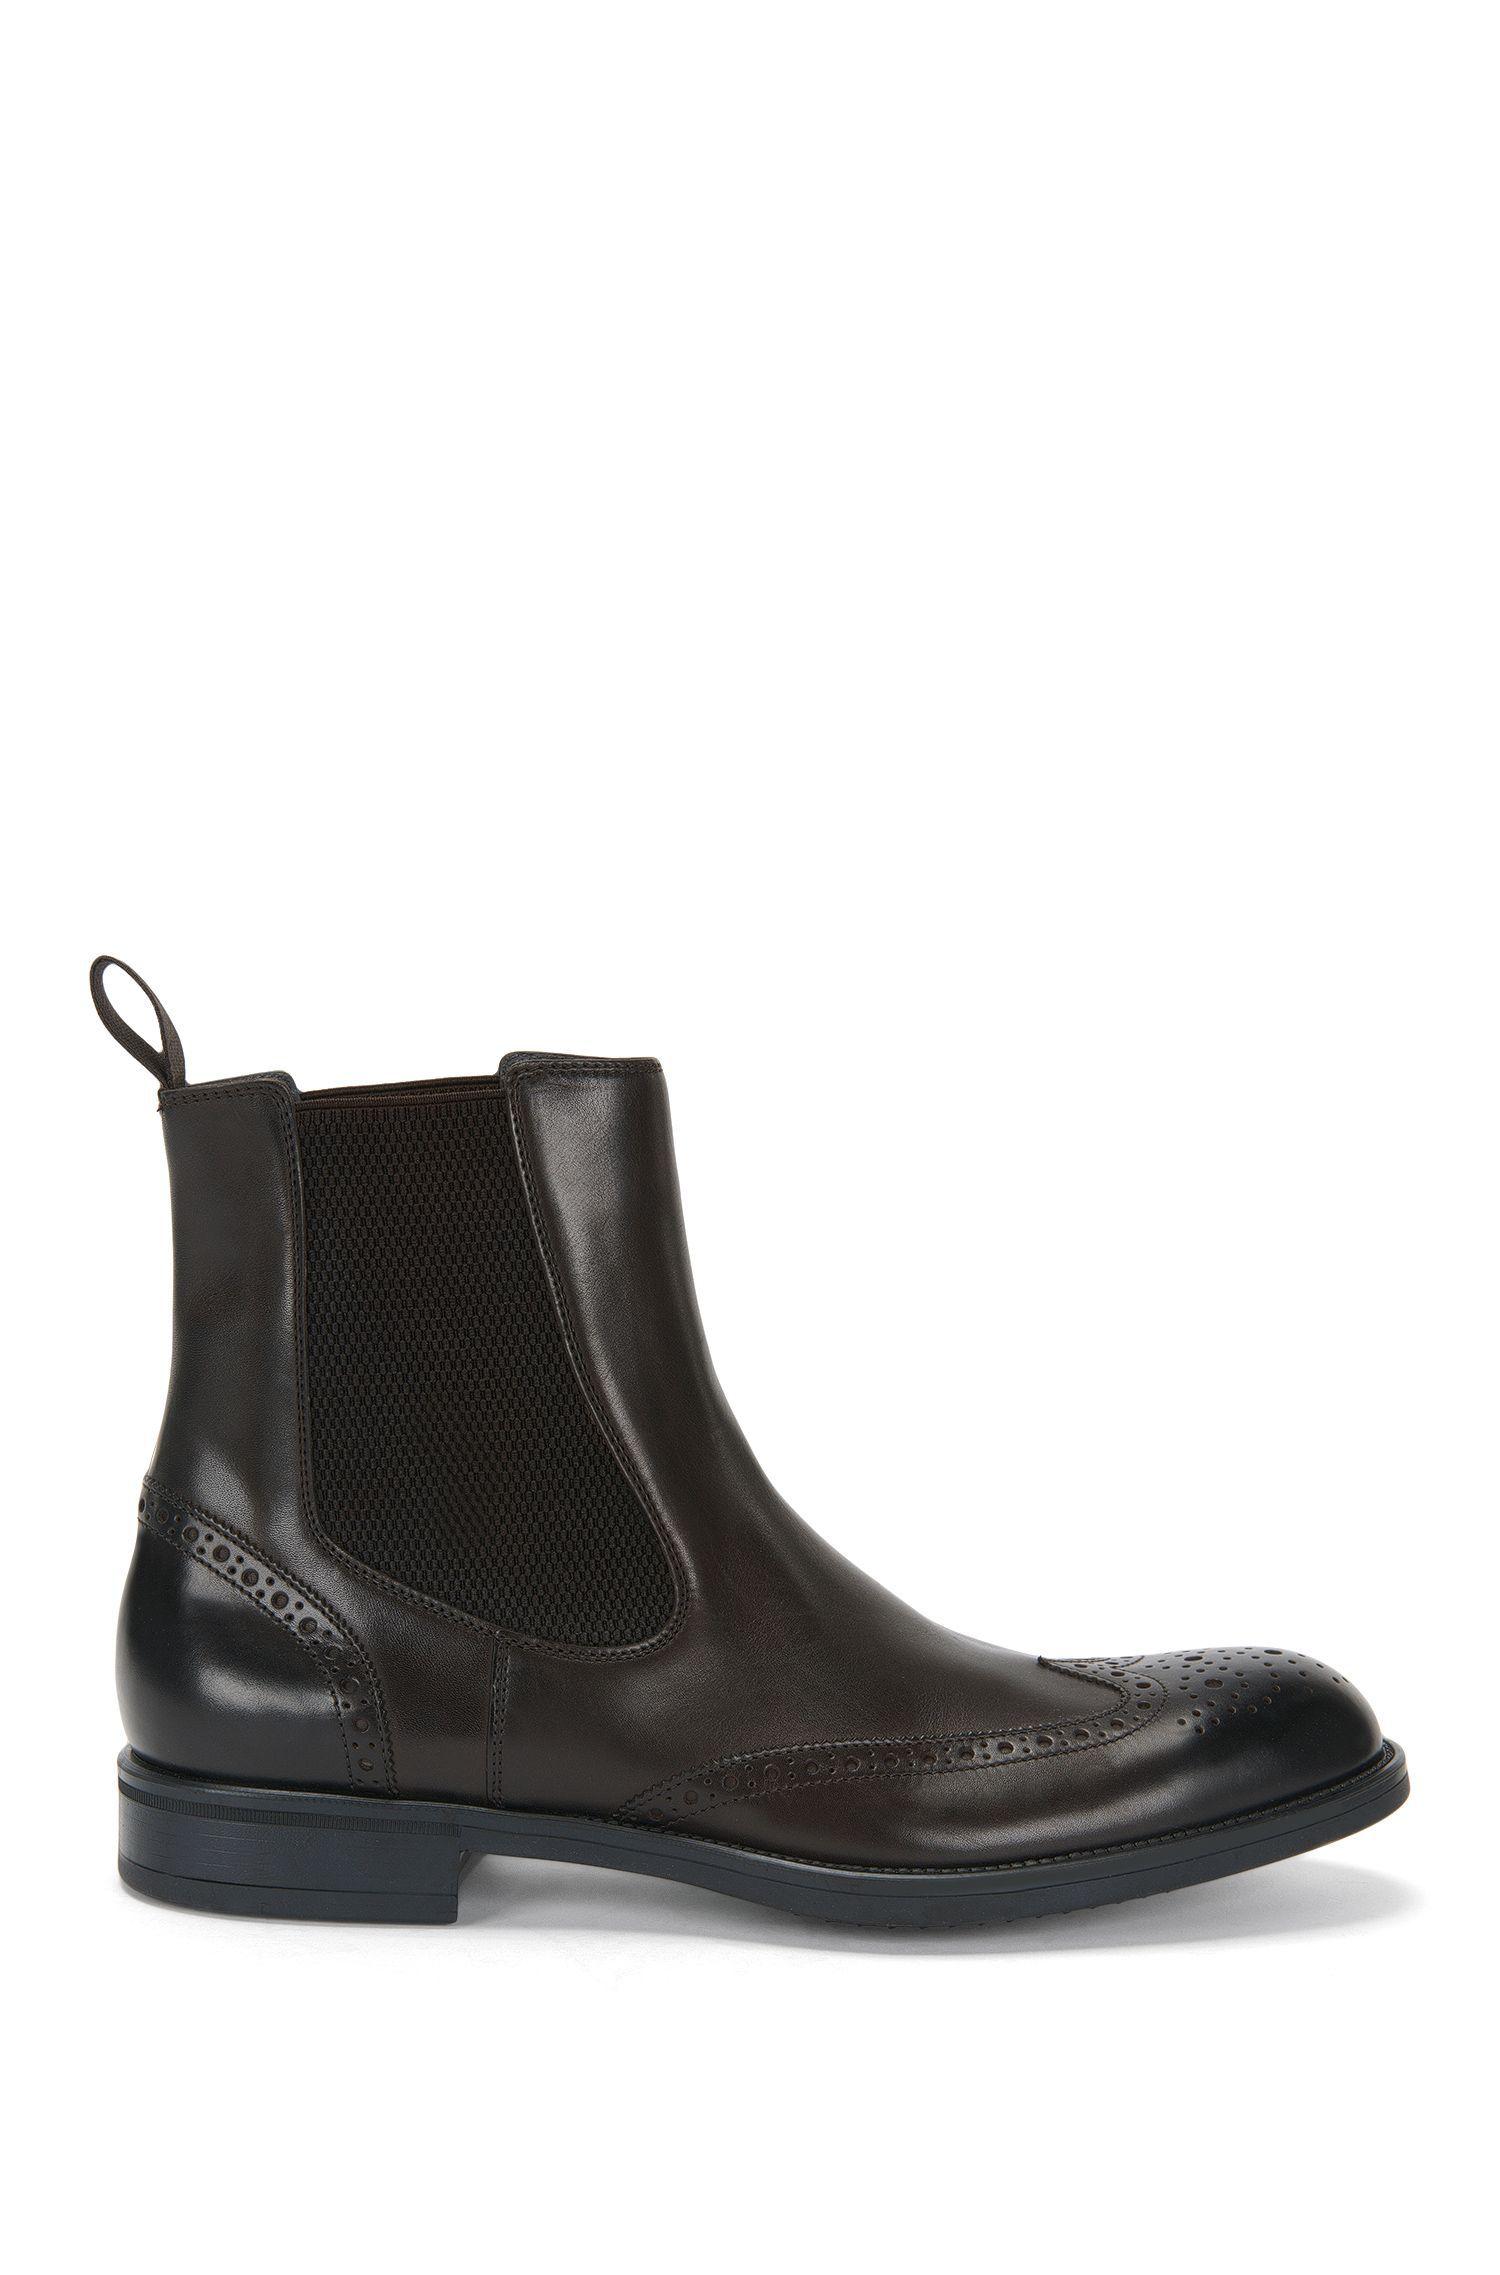 'Kenth Cheb Itwtb' | Italian Calfskin Pull On Brogue Boots